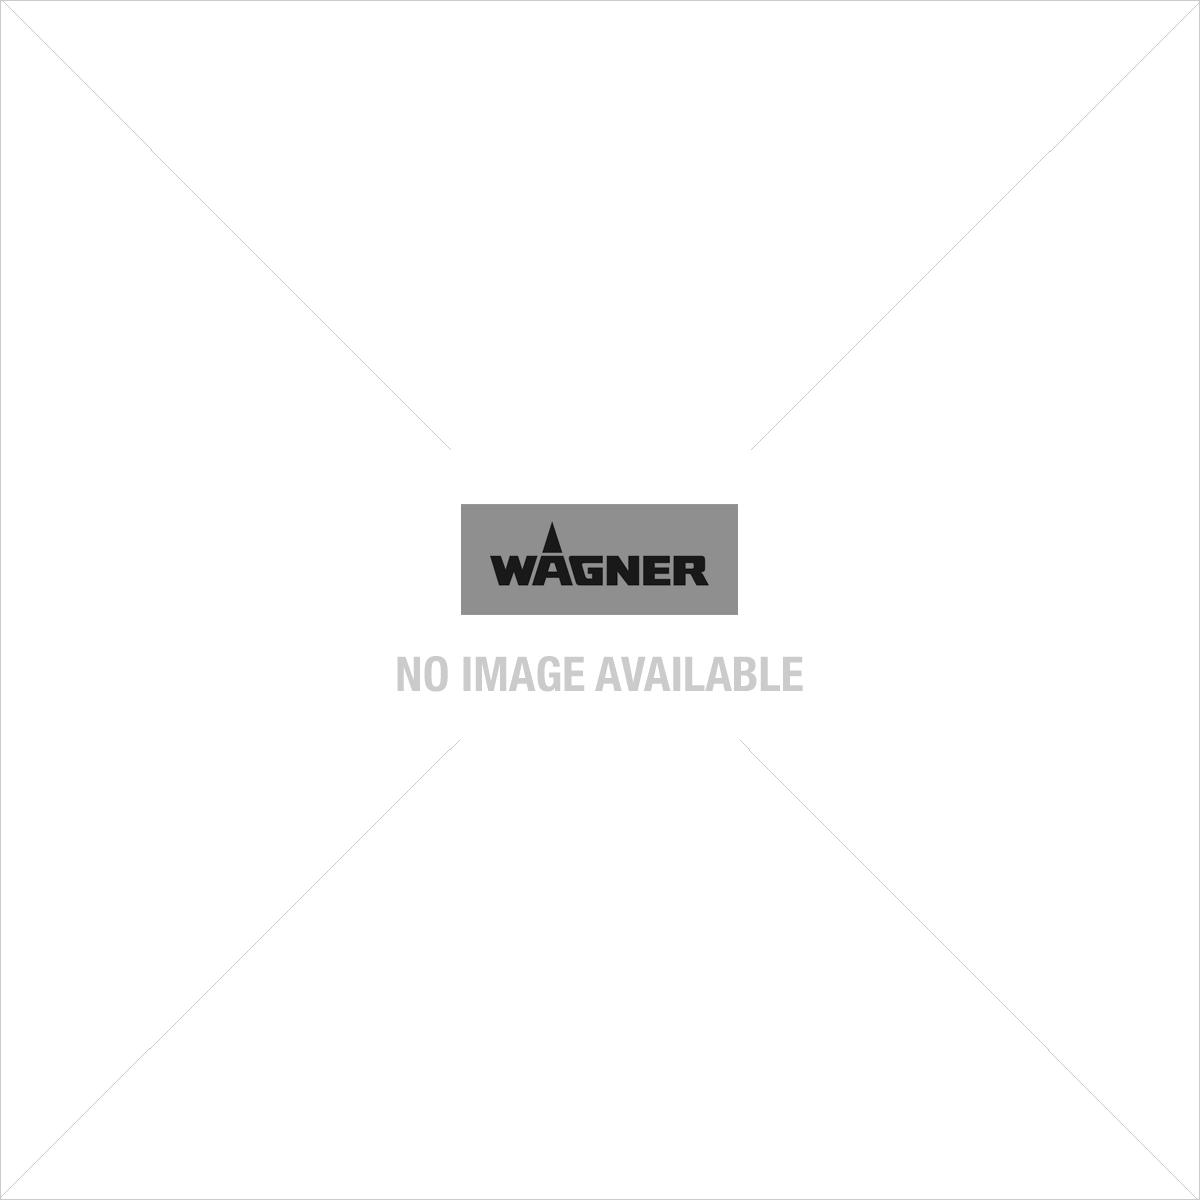 Wagner W 985 E WallPerfect pistolet a peinture, basse pression.